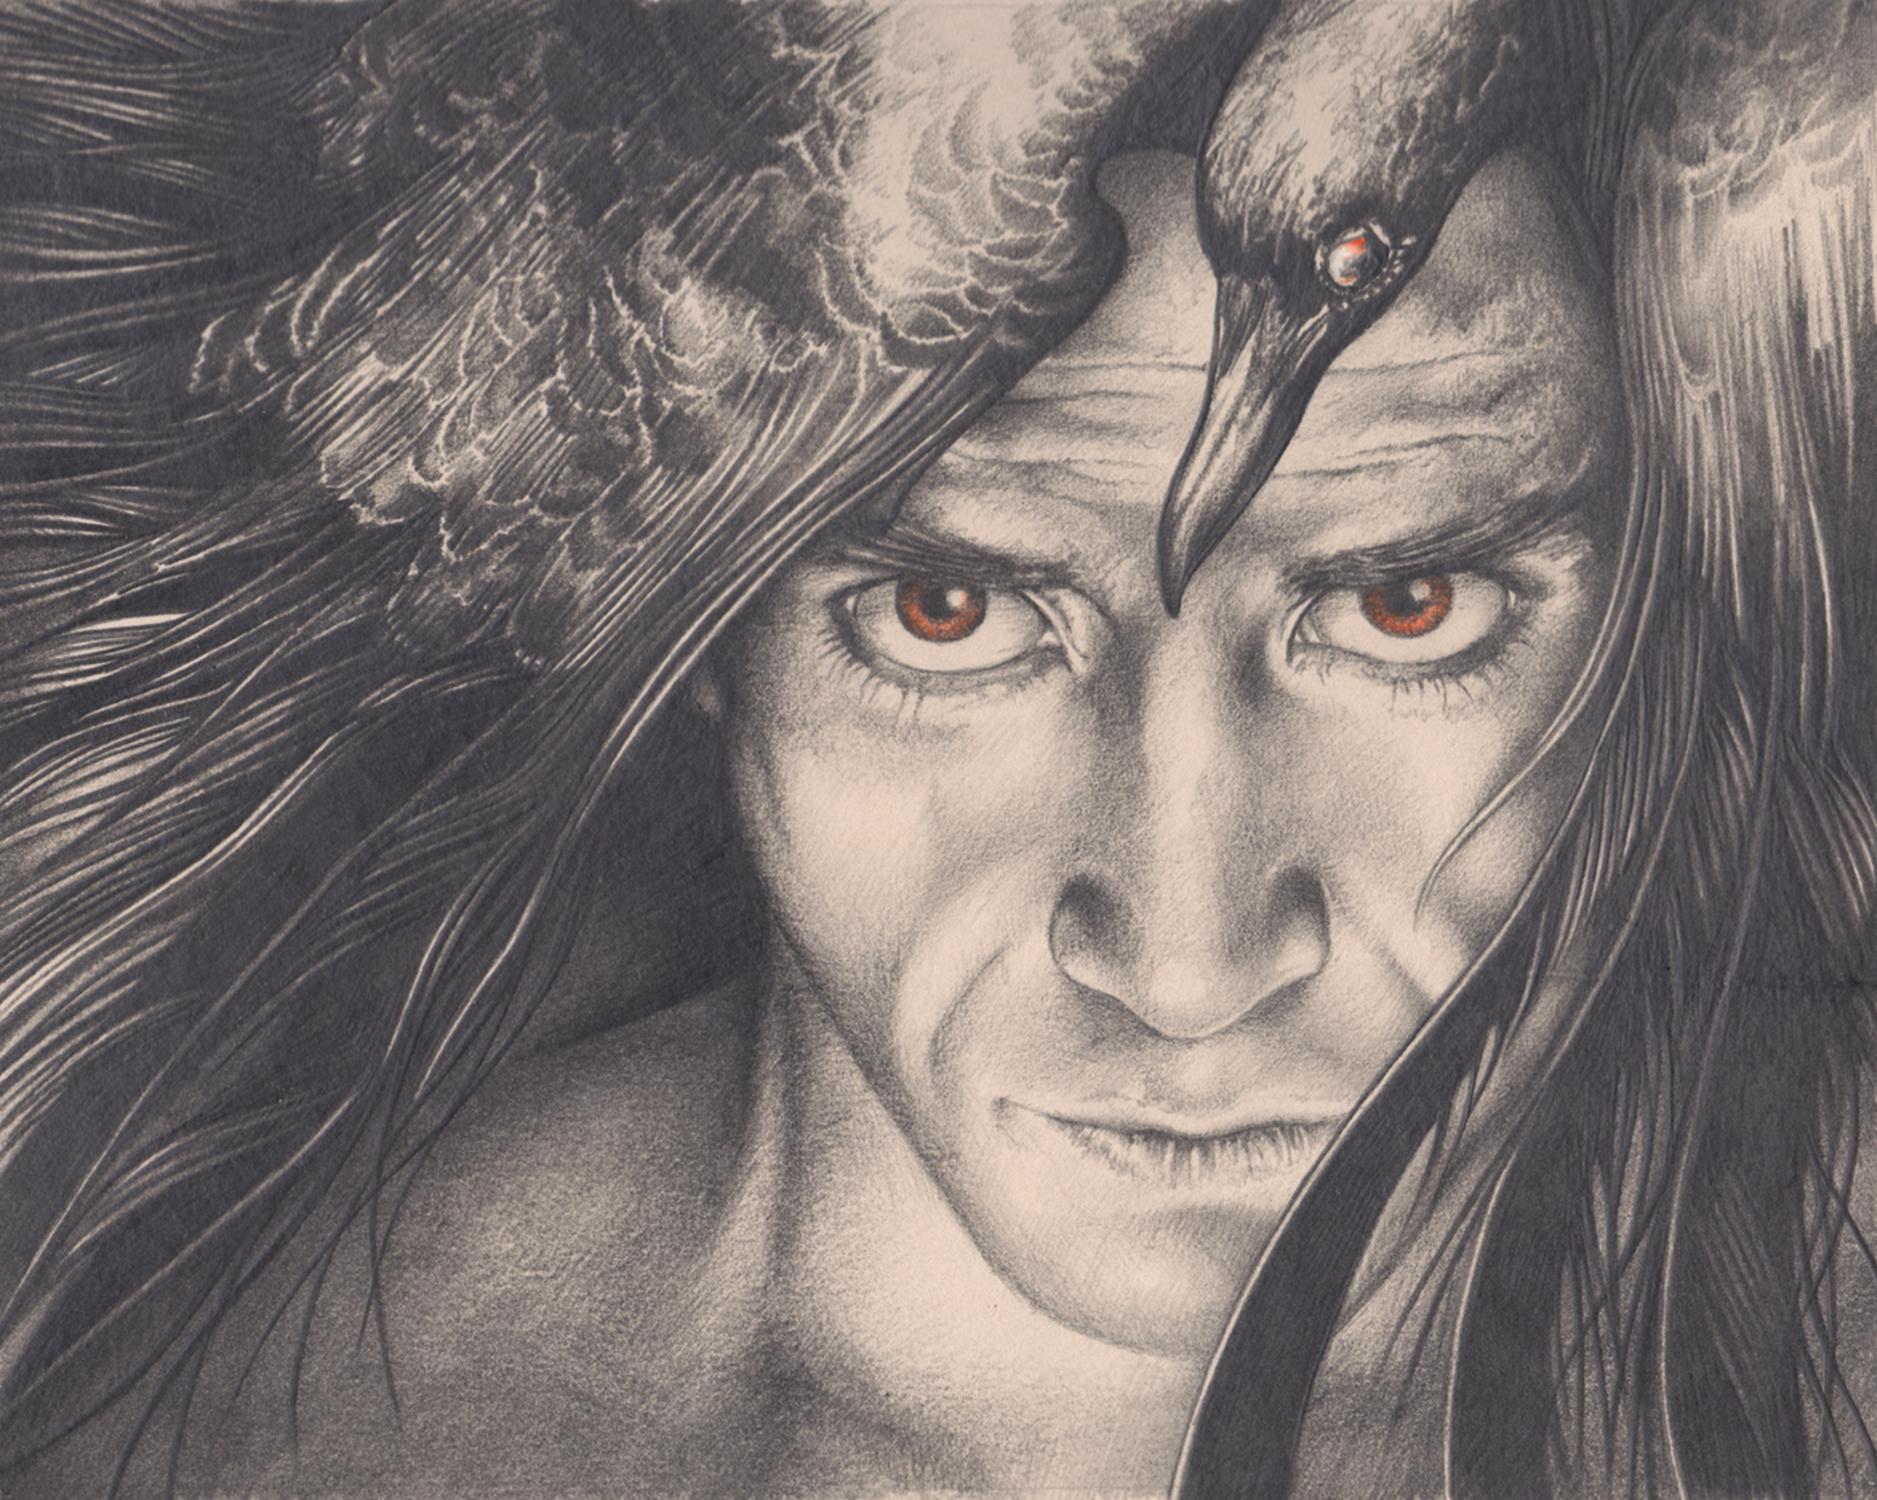 The Helloween King Artwork by Bonnie Helen Hawkins